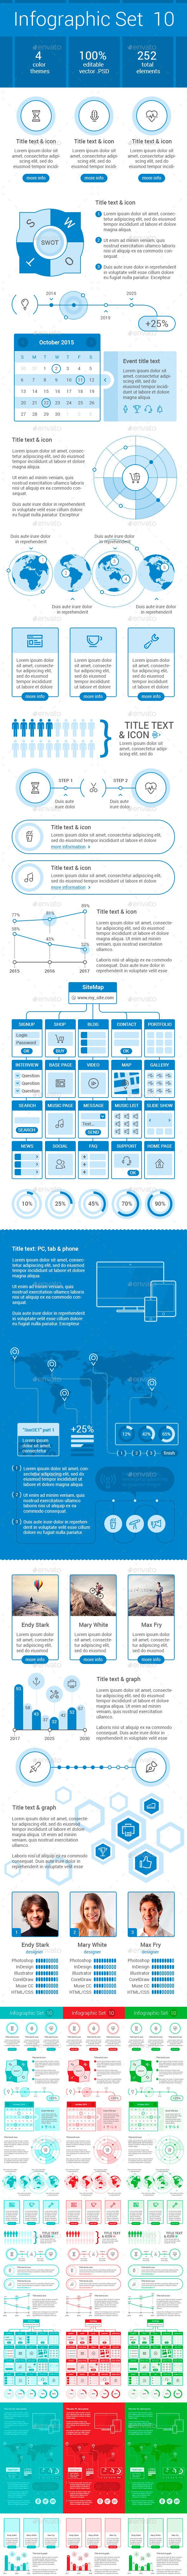 GraphicRiver Infographic SET 10 9224108